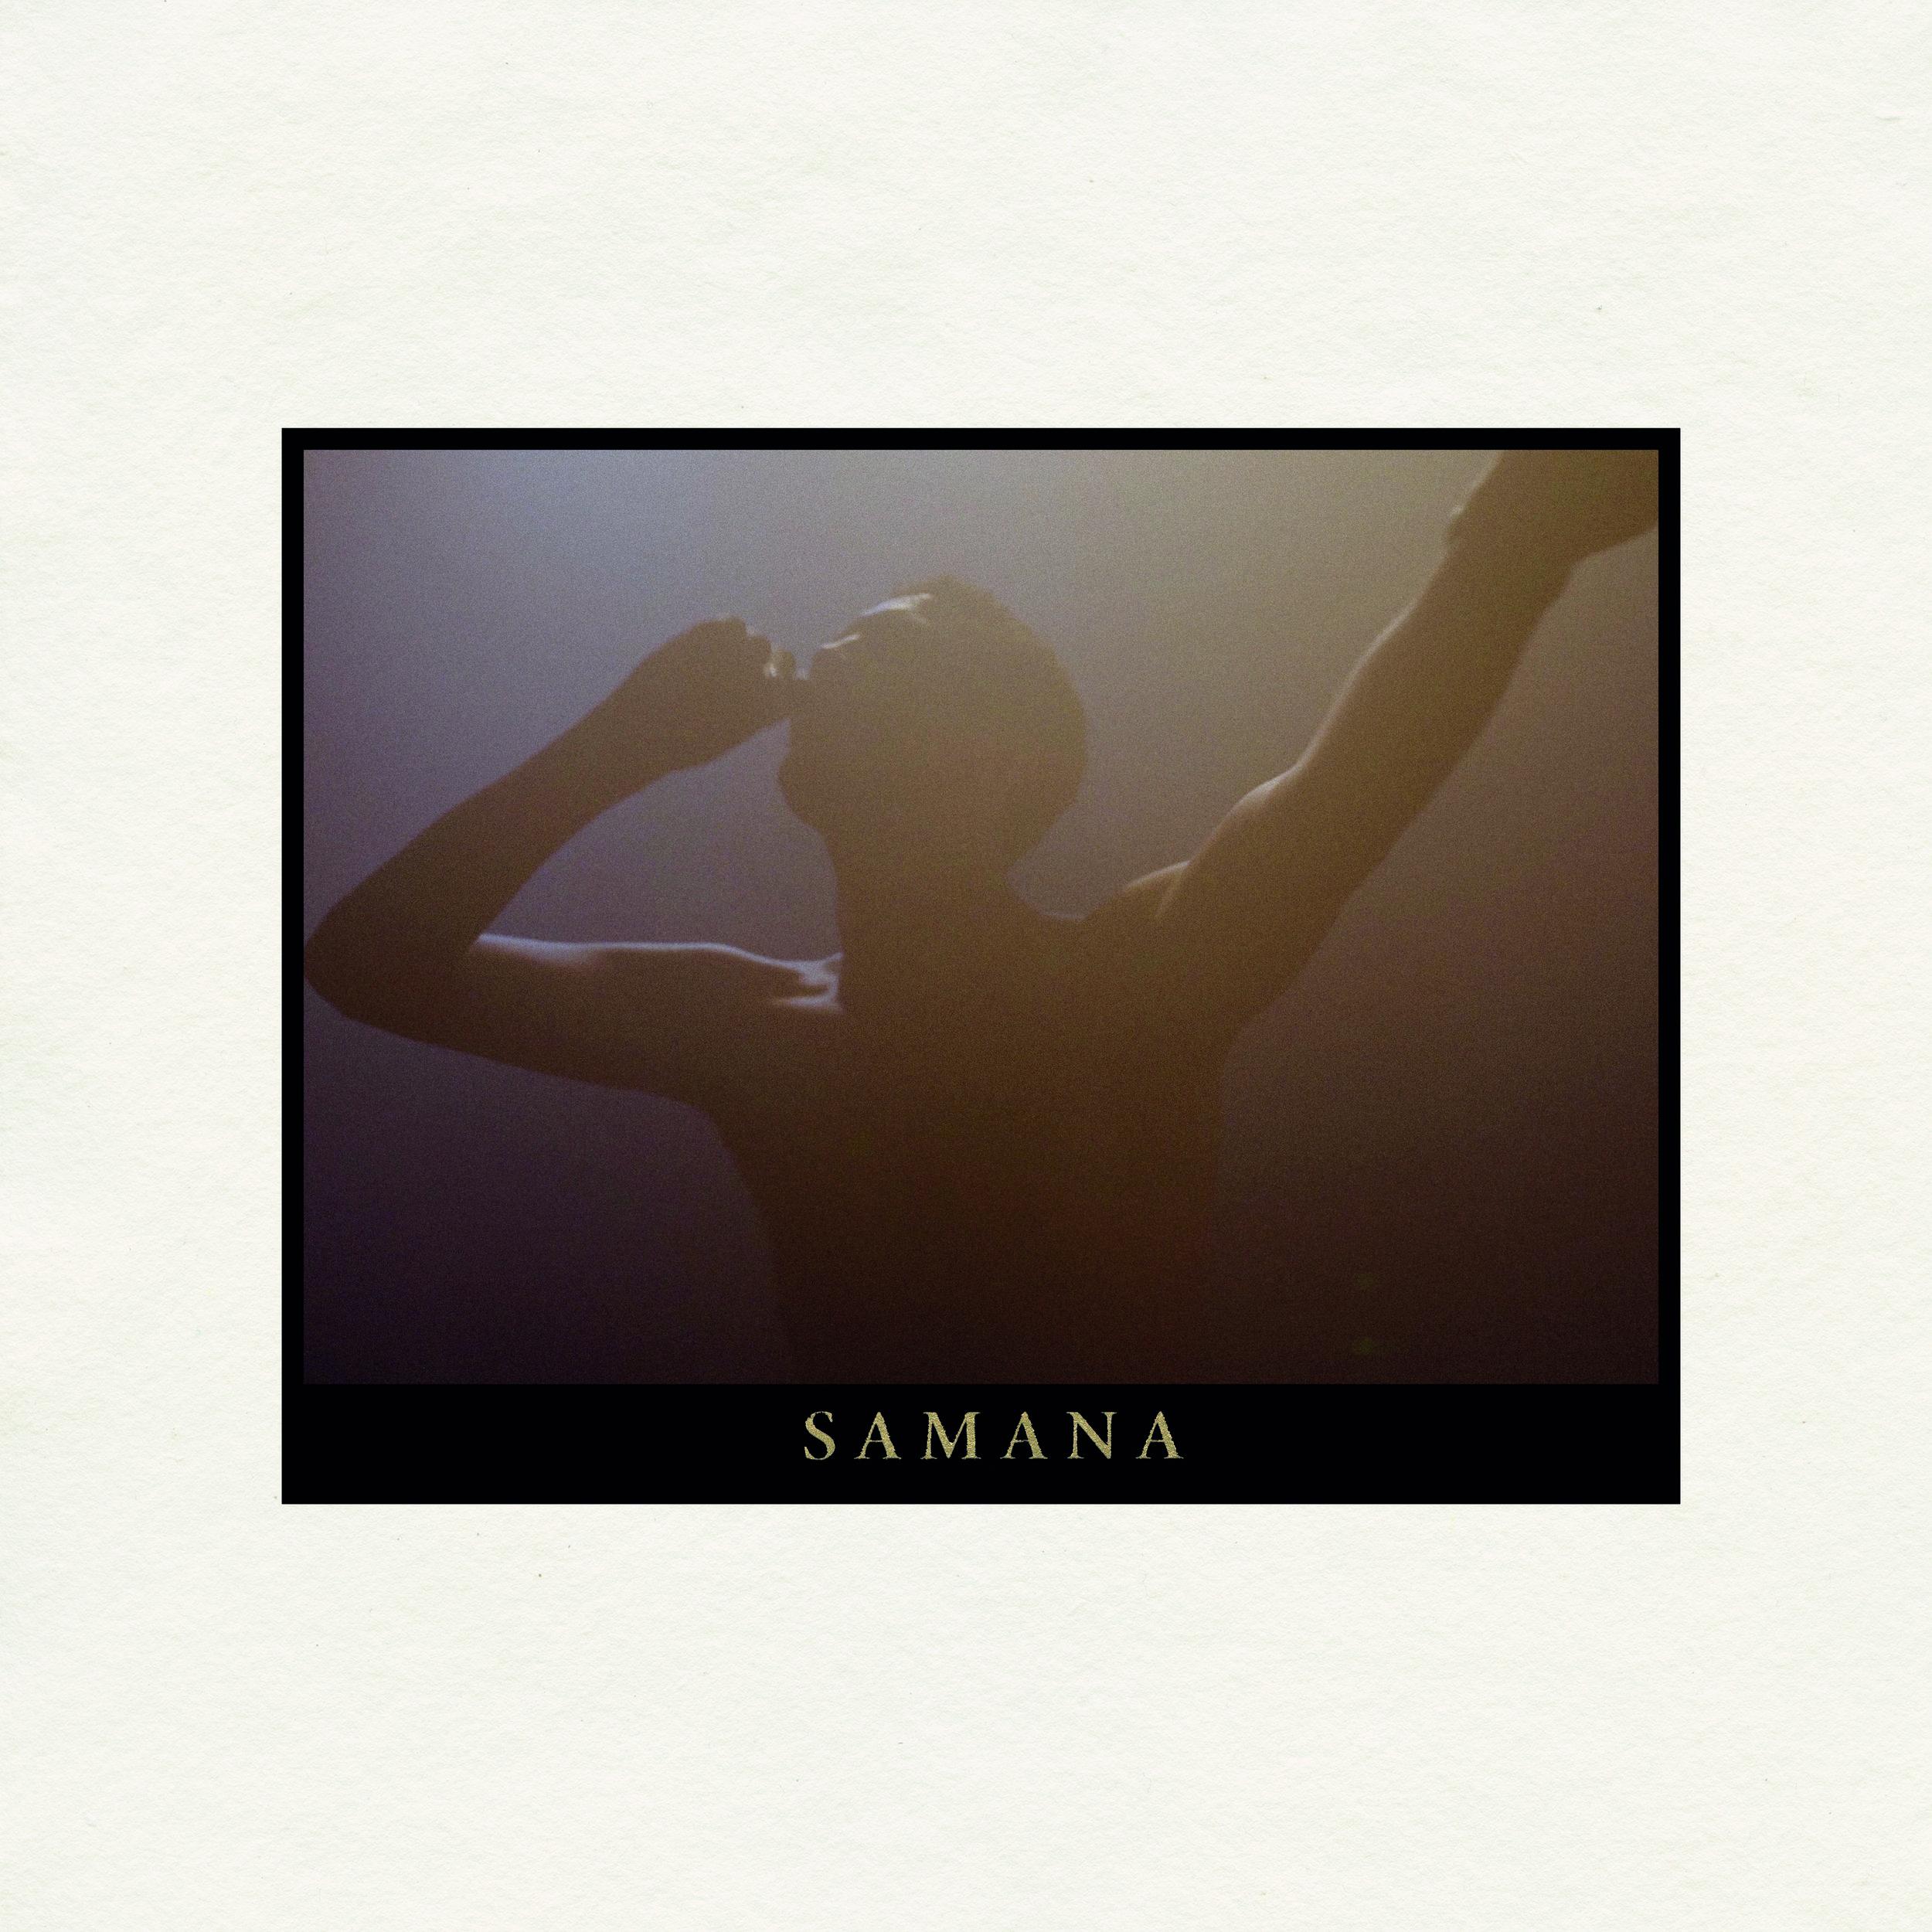 Samana, Samana Music, Harvest, Samana Harvest, Samana Harvest music video, Harvest film still